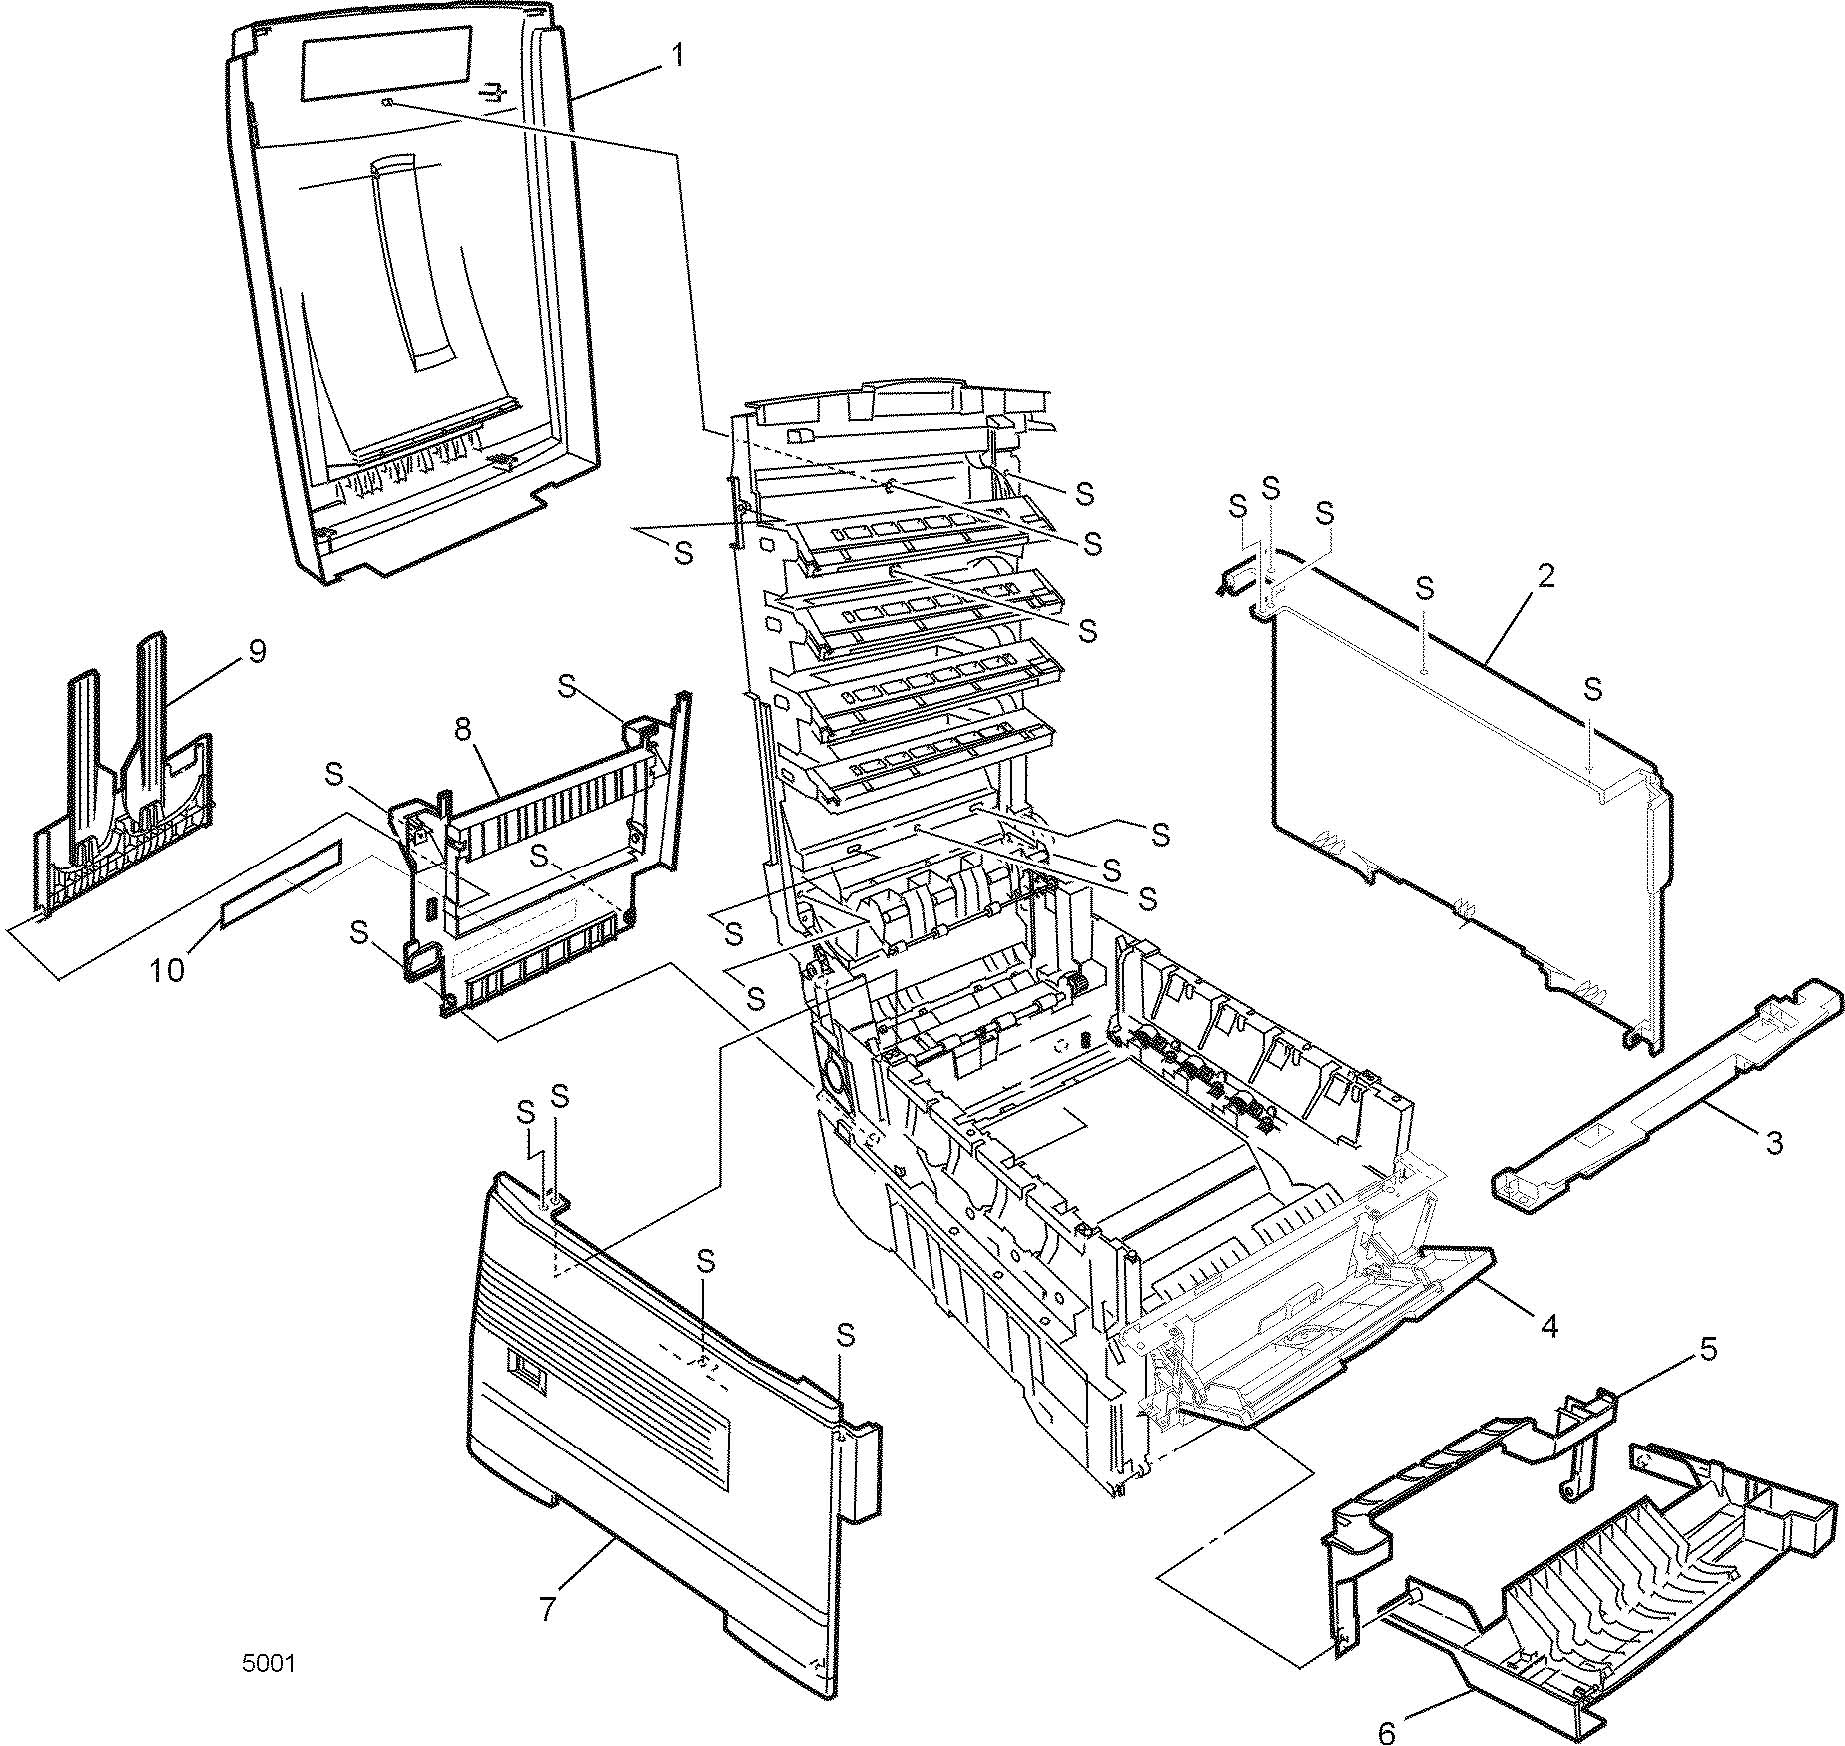 Xerox Tektronix 1235 802K2403 MPT Bypass Feeder Assy